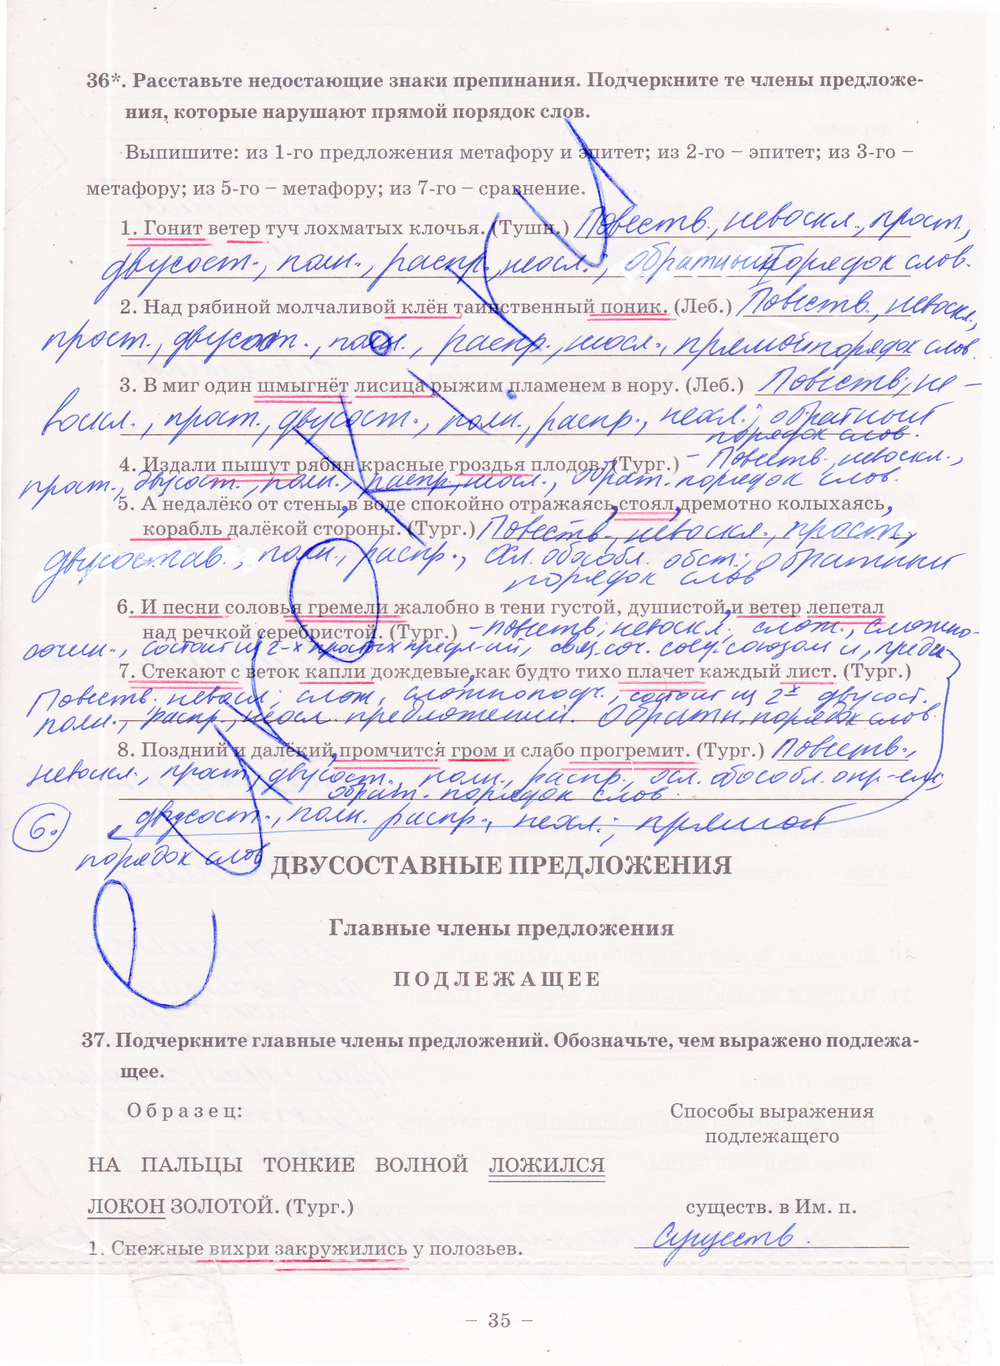 гдз по русскому языку 8 класс богданова рабочая тетрадь ч.1